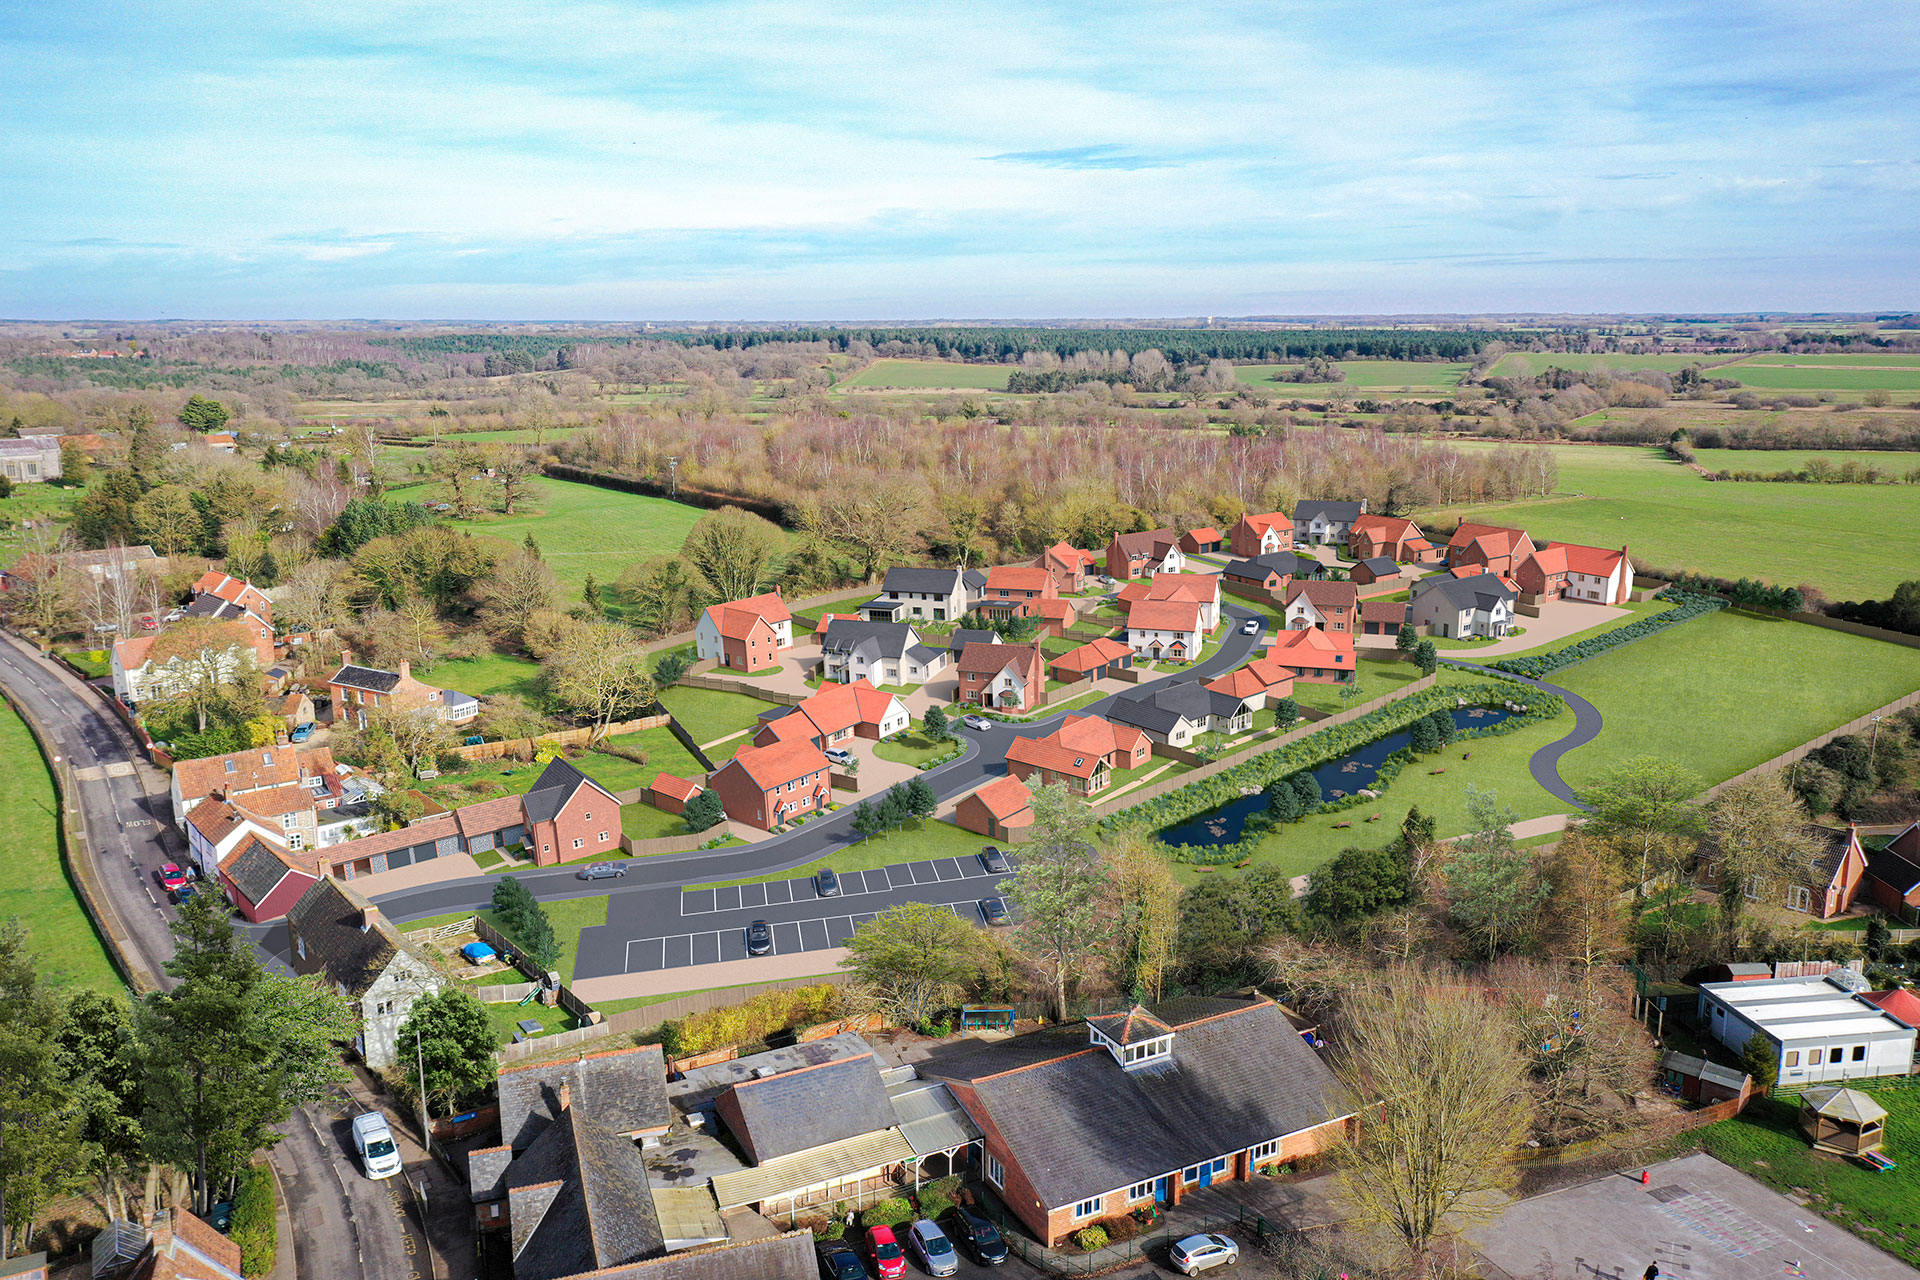 North Elmham aerial view